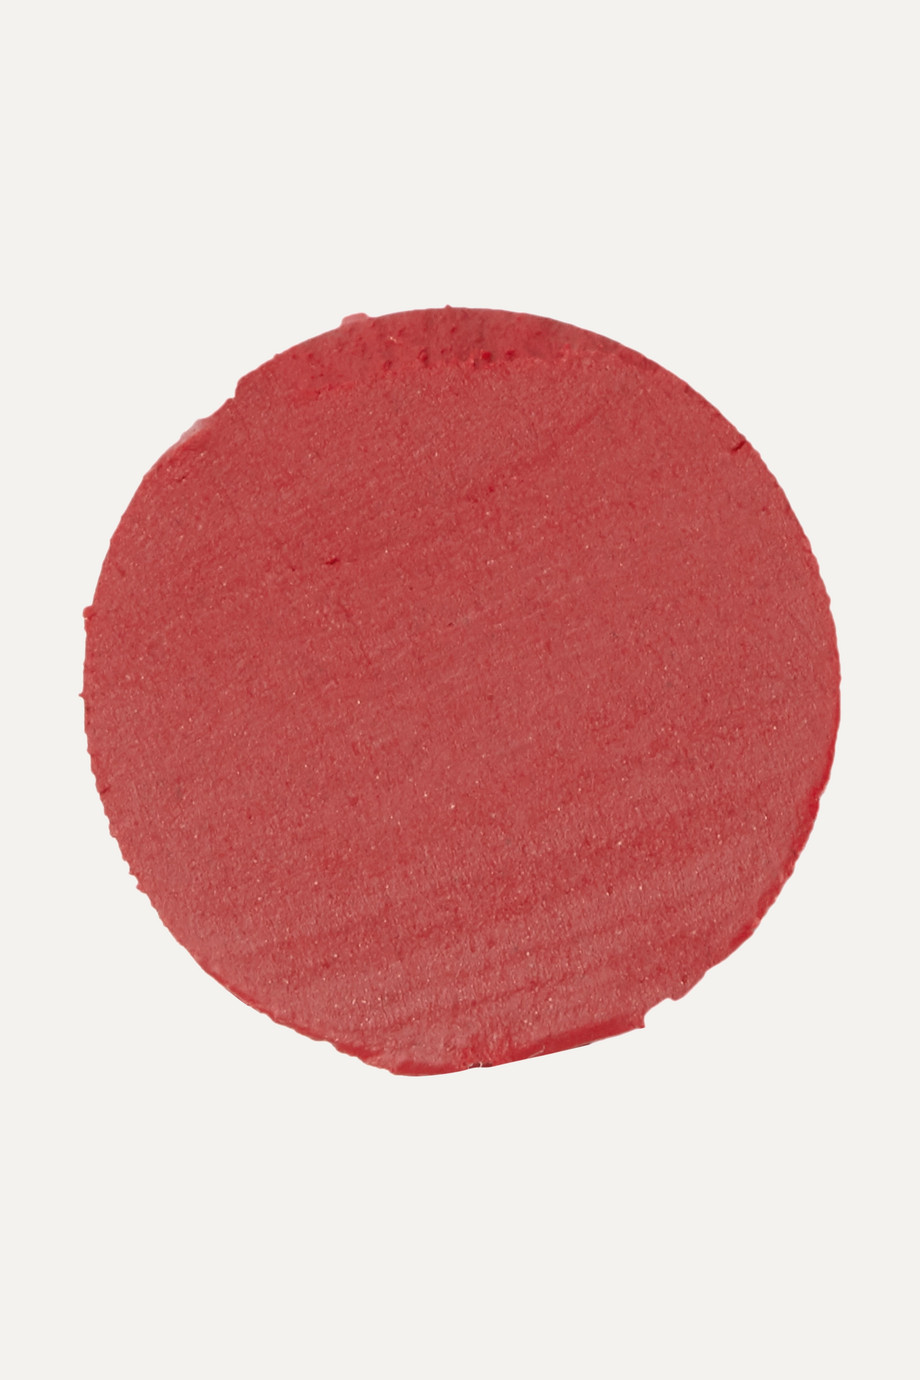 Charlotte Tilbury Rouge à lèvres Hot Lips 2, Carina's Star